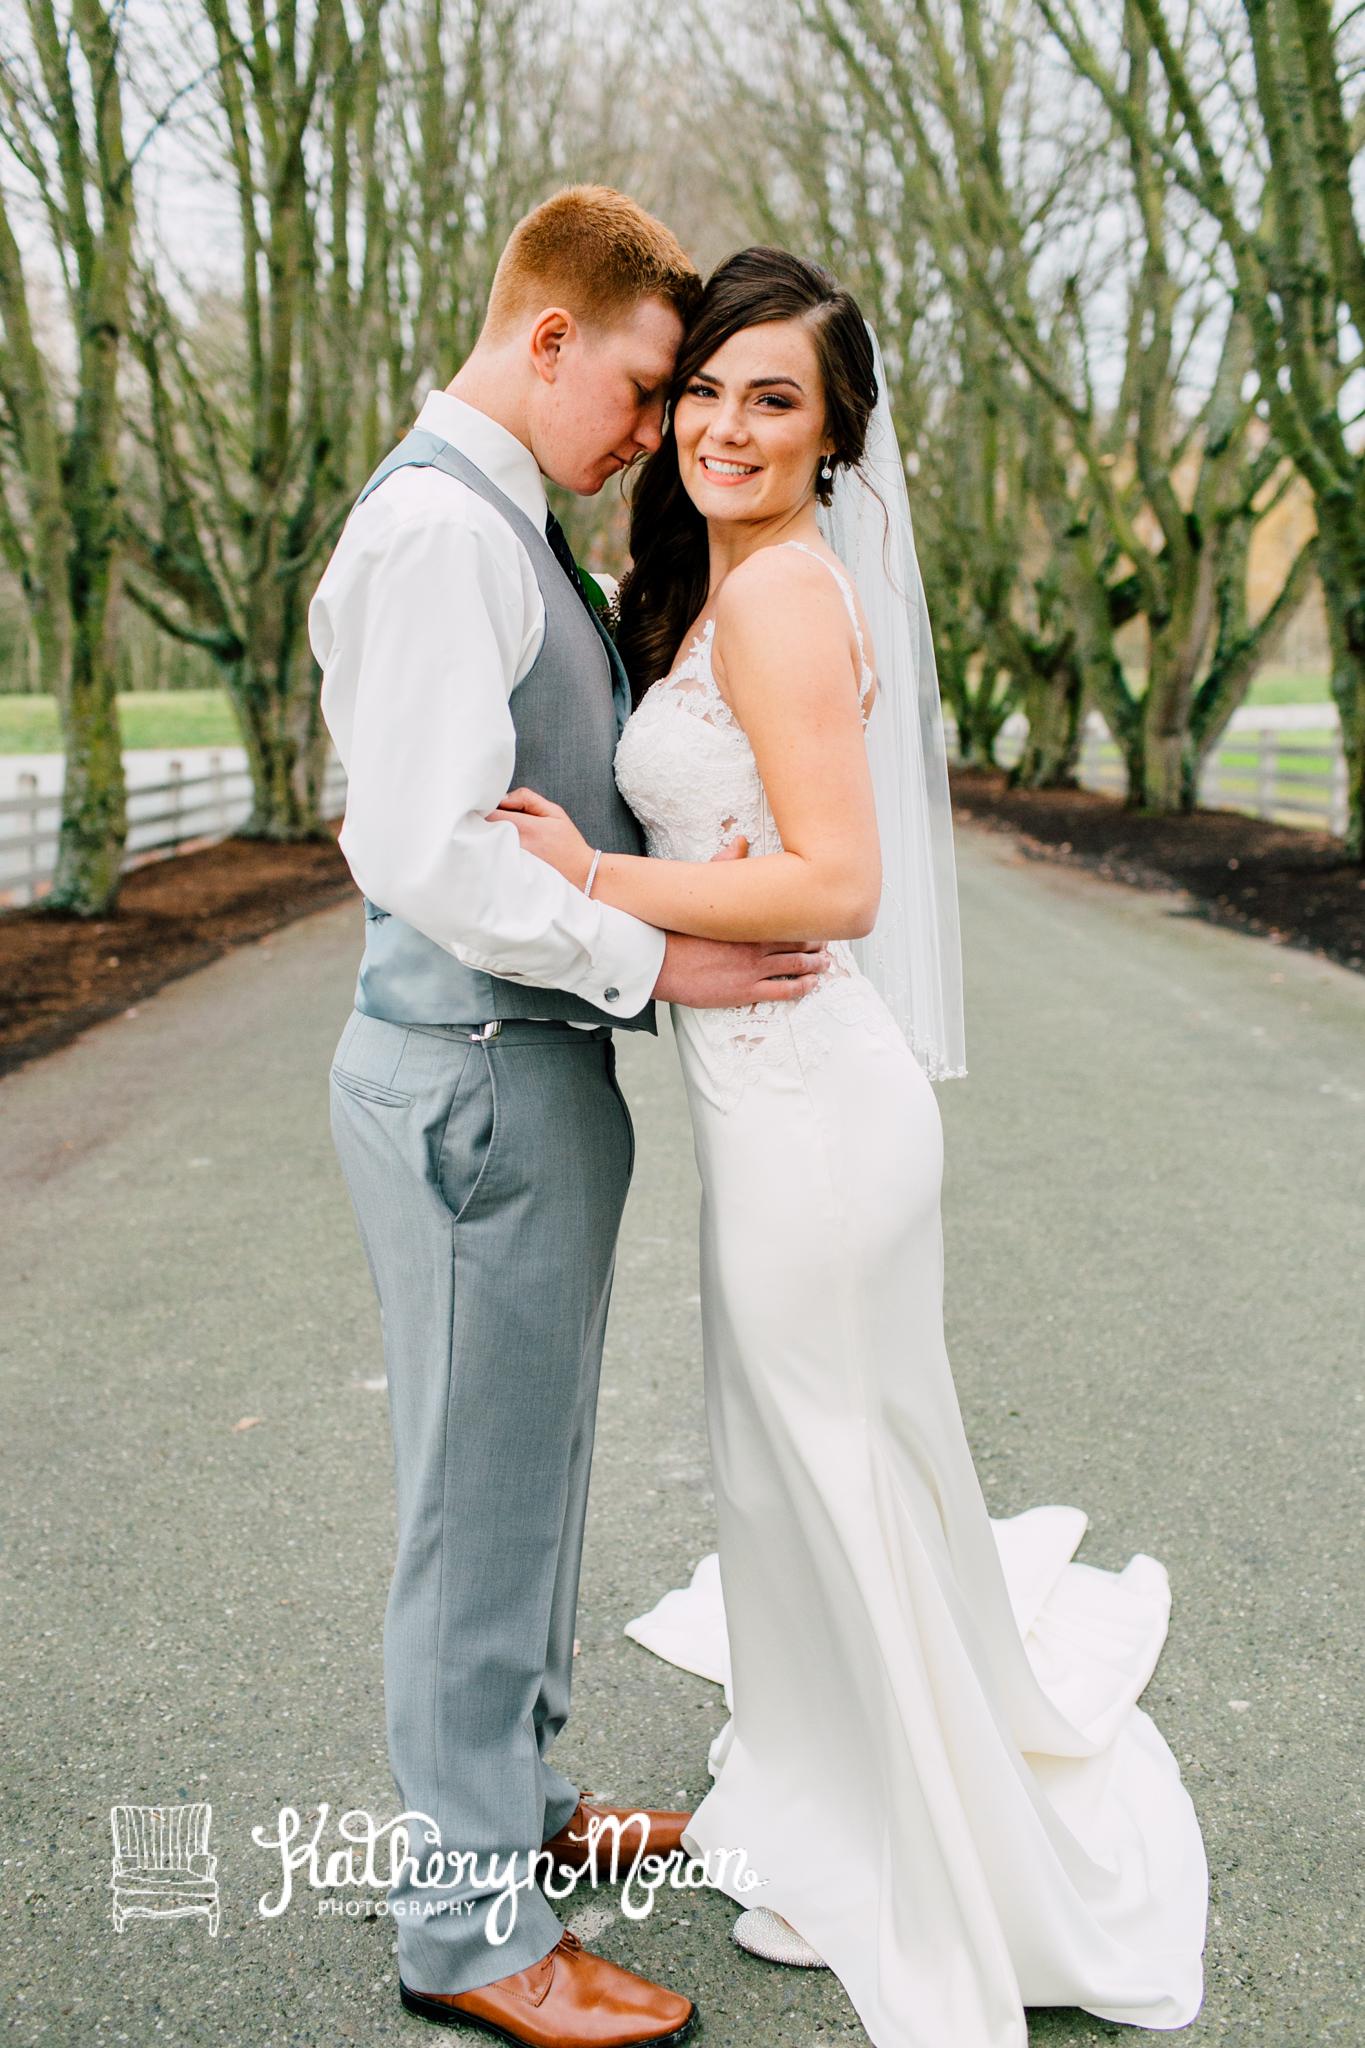 maplehurst-farm-wedding-katheryn-moran-photography-koogle-5.jpg